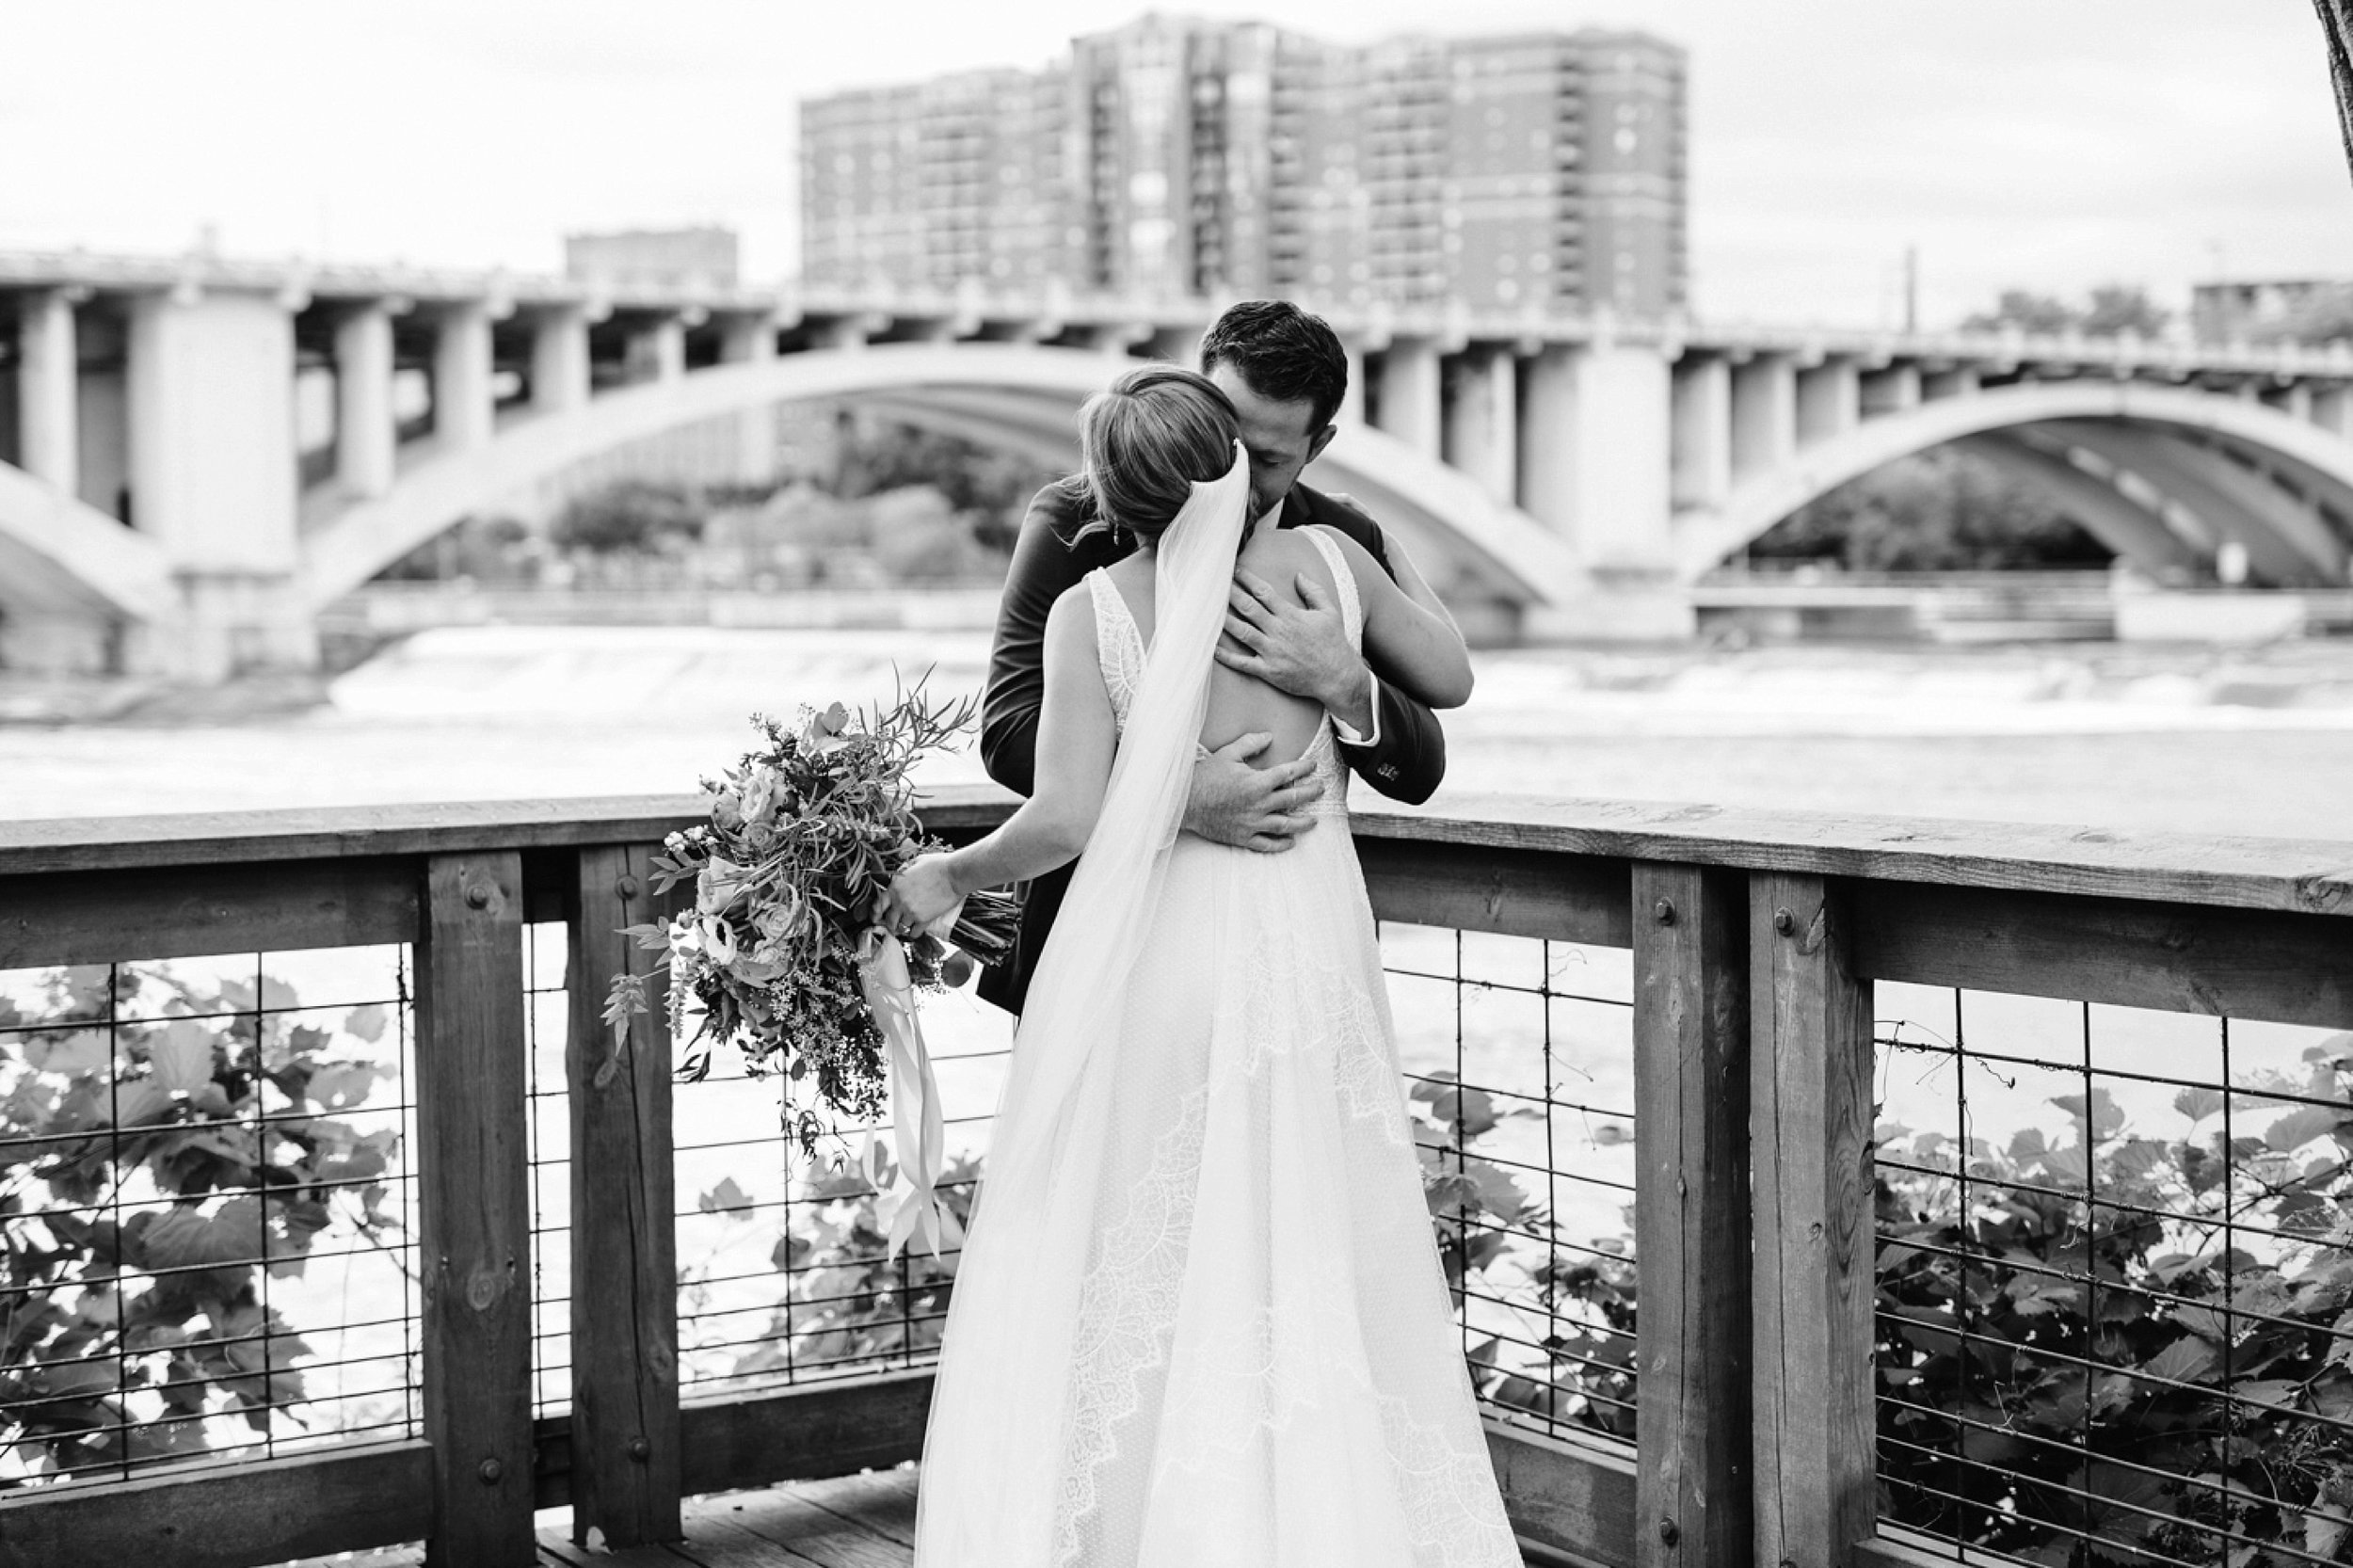 Nicollet-Island-Pavilion-Minneapolis-September-Coral-Navy-Wedding-33.jpg